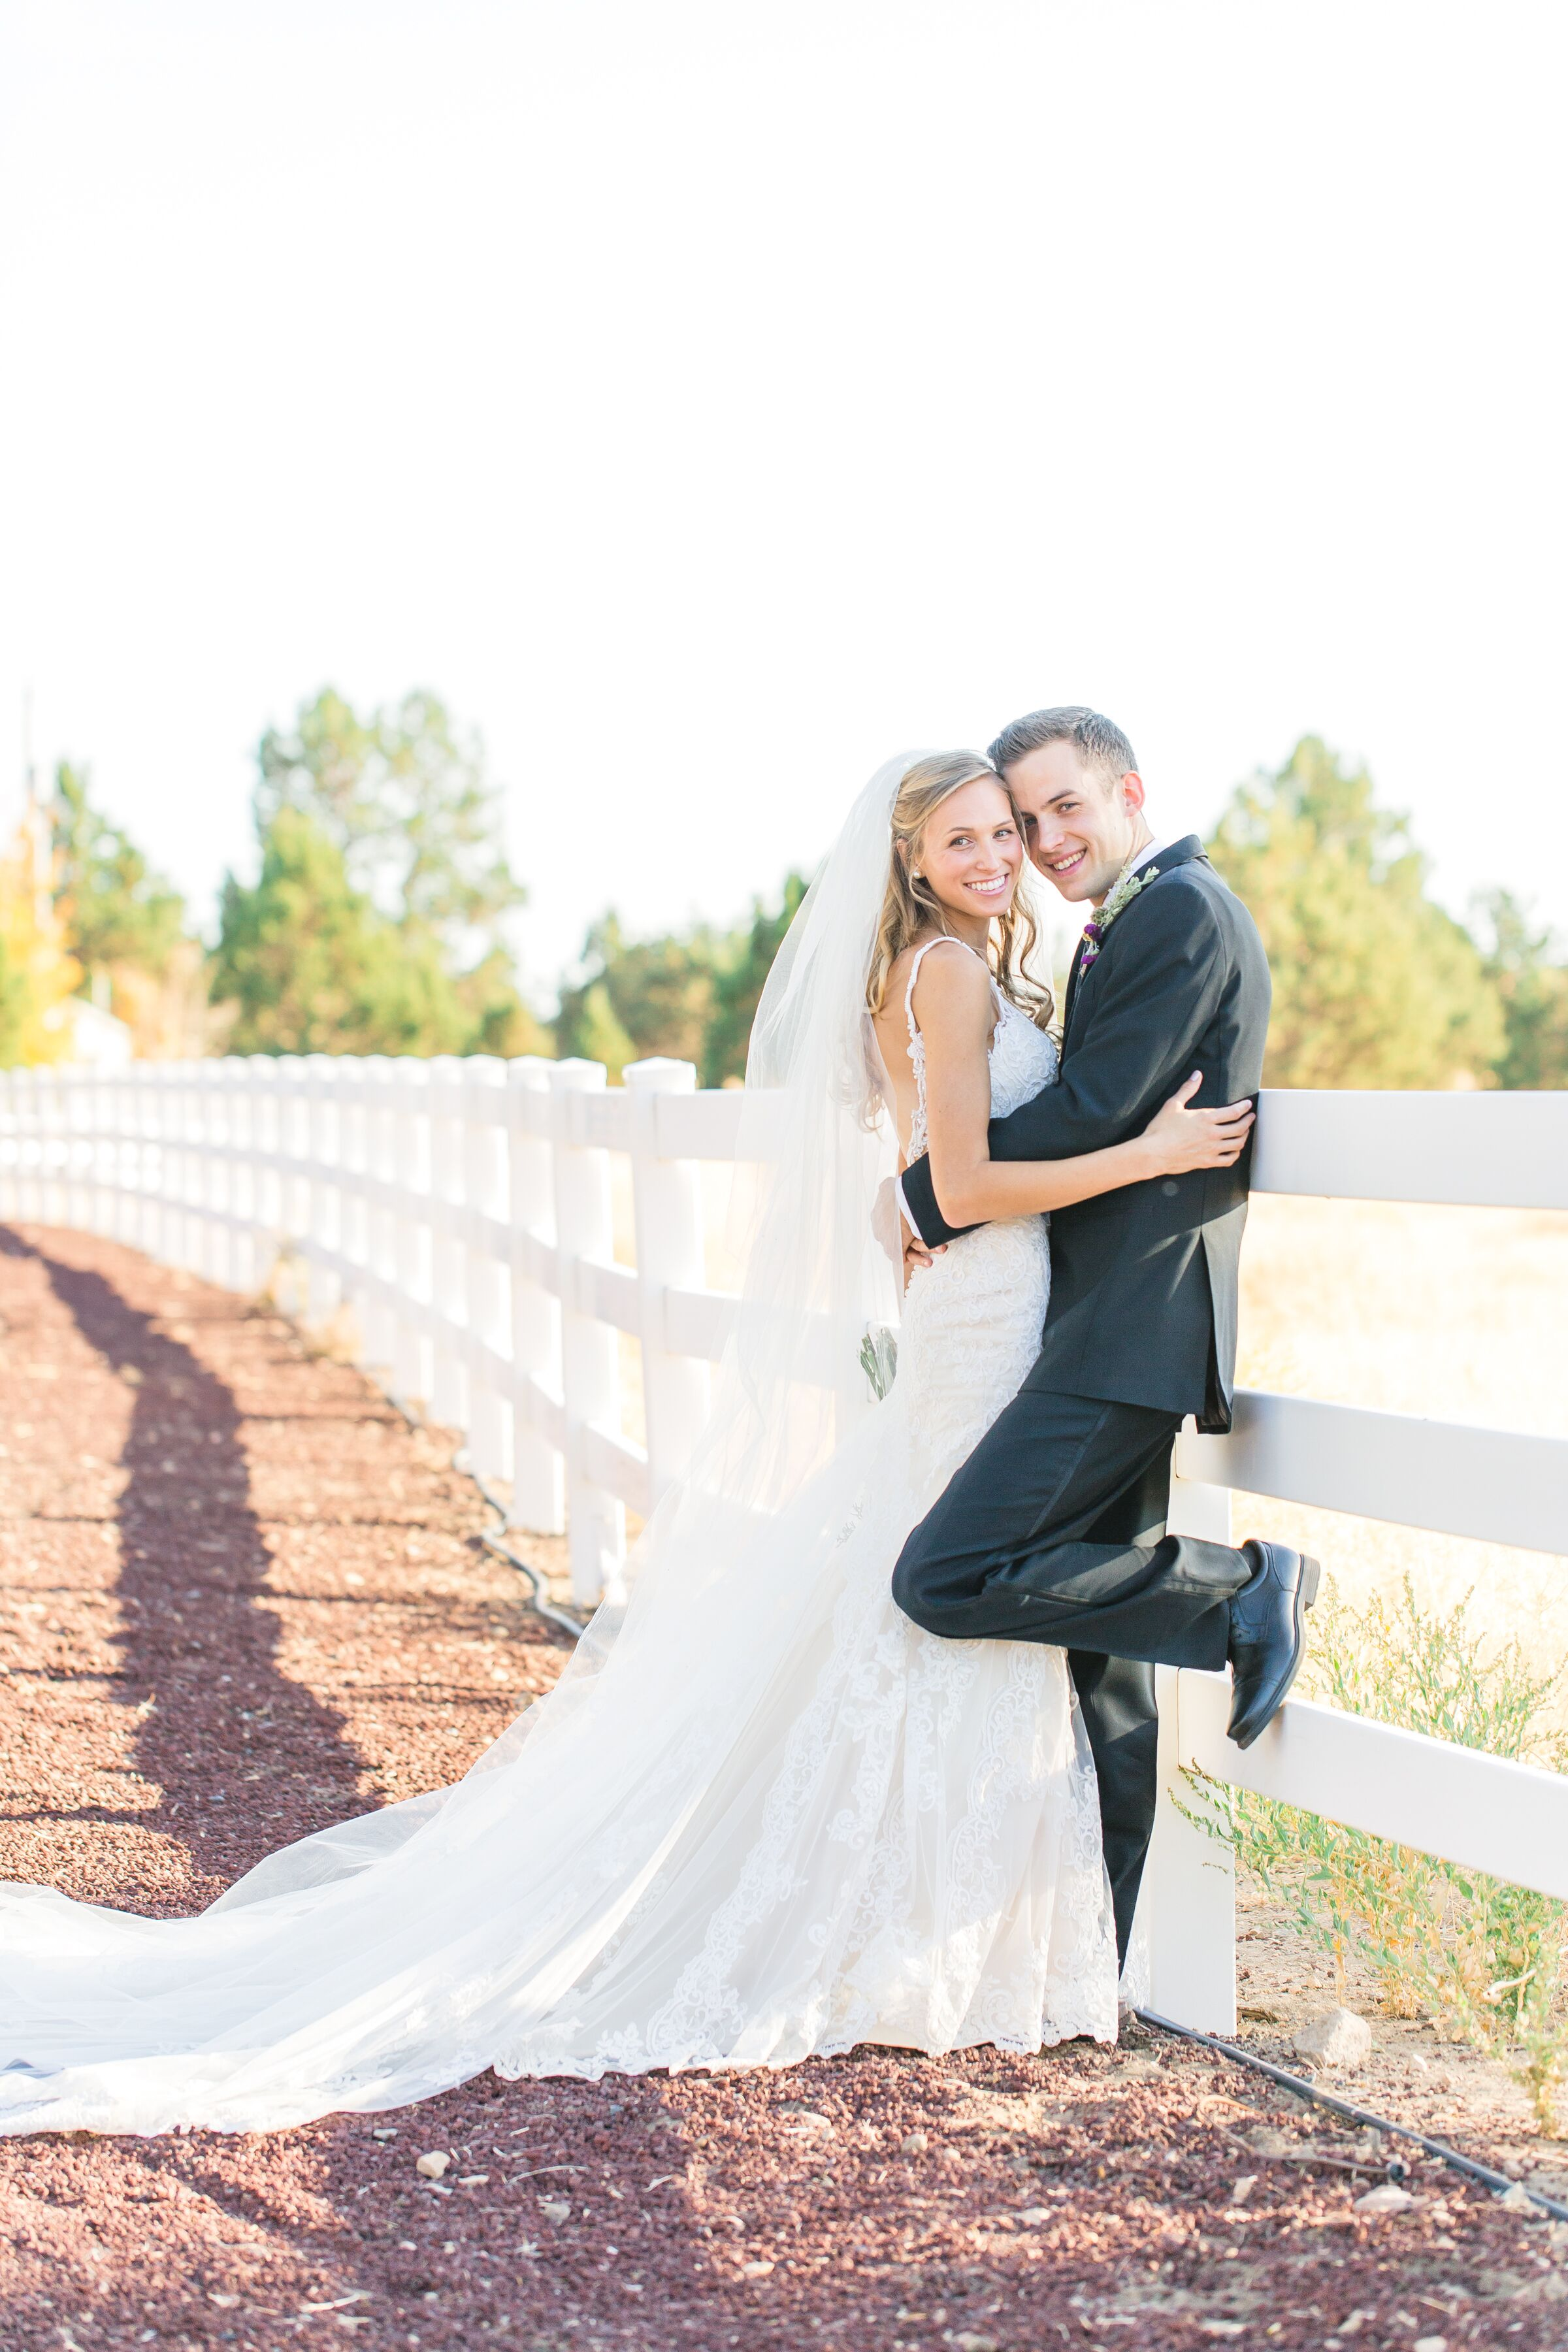 50 Weddings, 50 States 2017 Winners